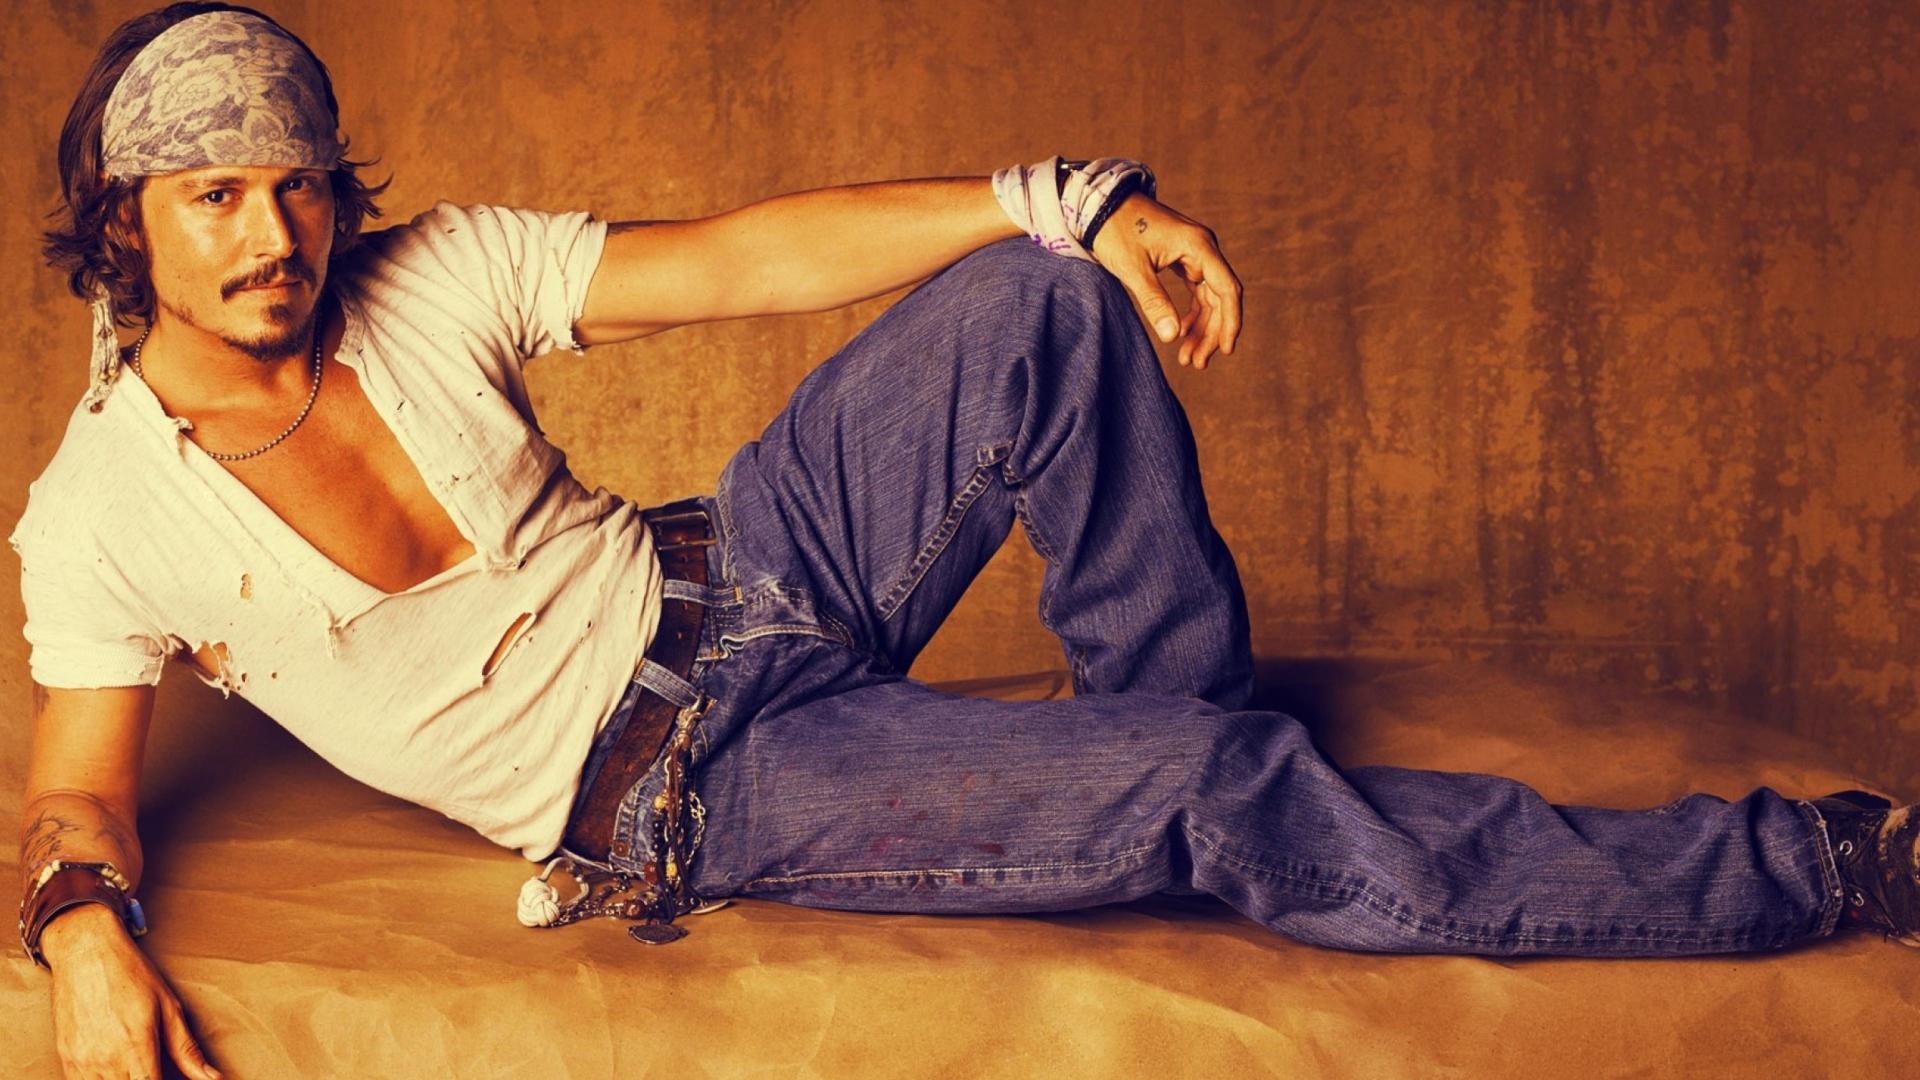 Johnny Depp Sfondi Gratuiti Per Desktop 1920x1080 Full HD